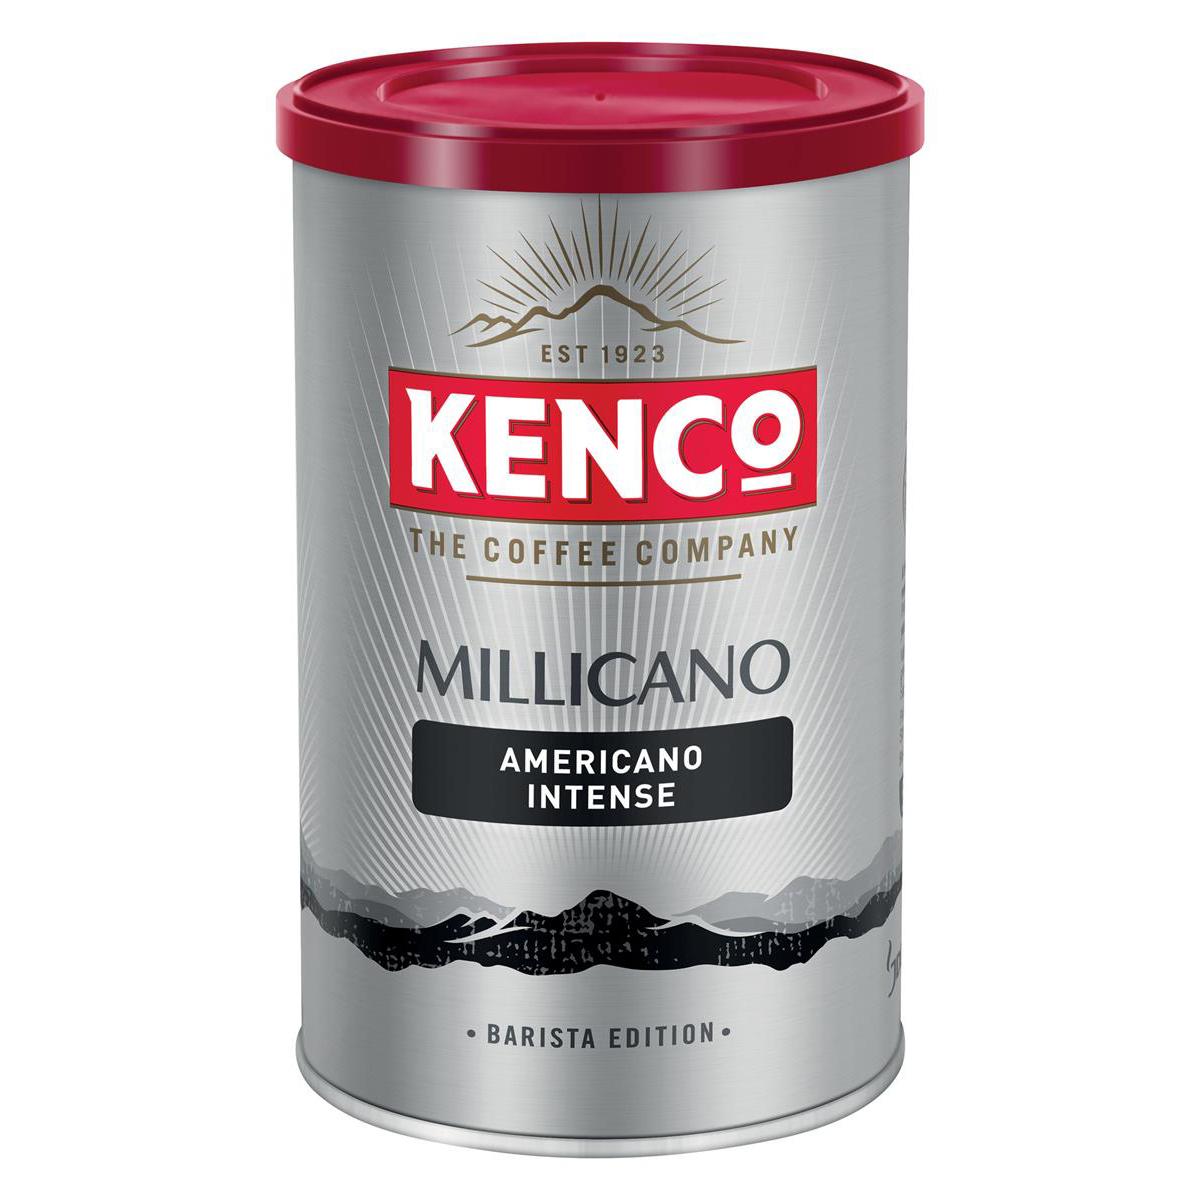 Kenco Millicano Coffee Wholebean Instant Dark Roast 100g Ref 4032095